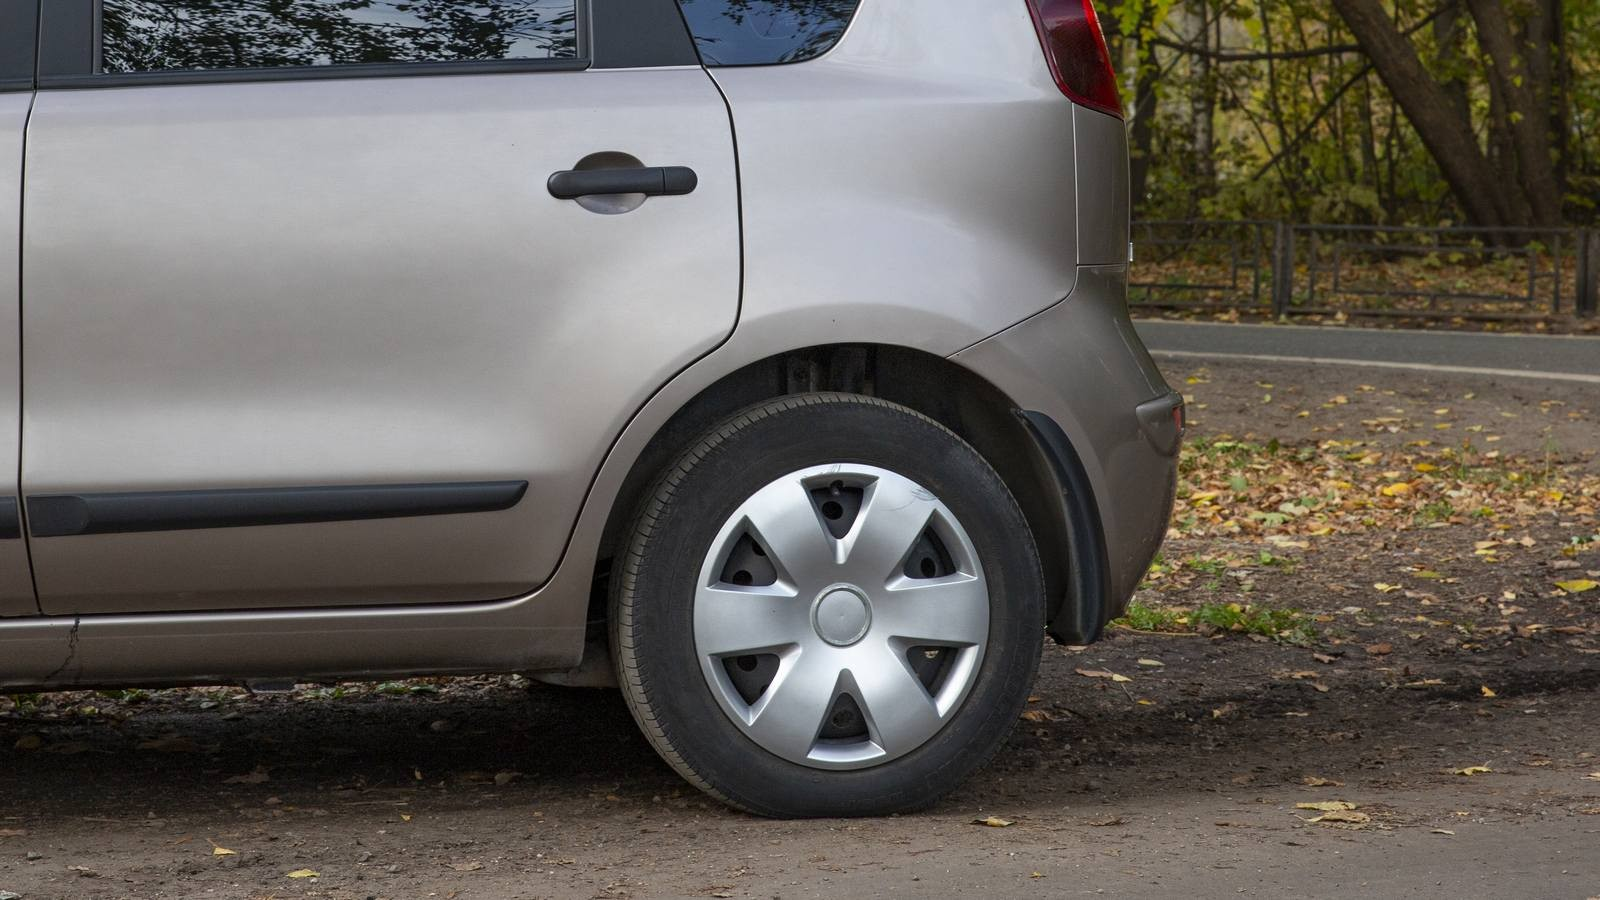 Недостатки и слабые места Ниссан Ноут с пробегом   Nissan Note  